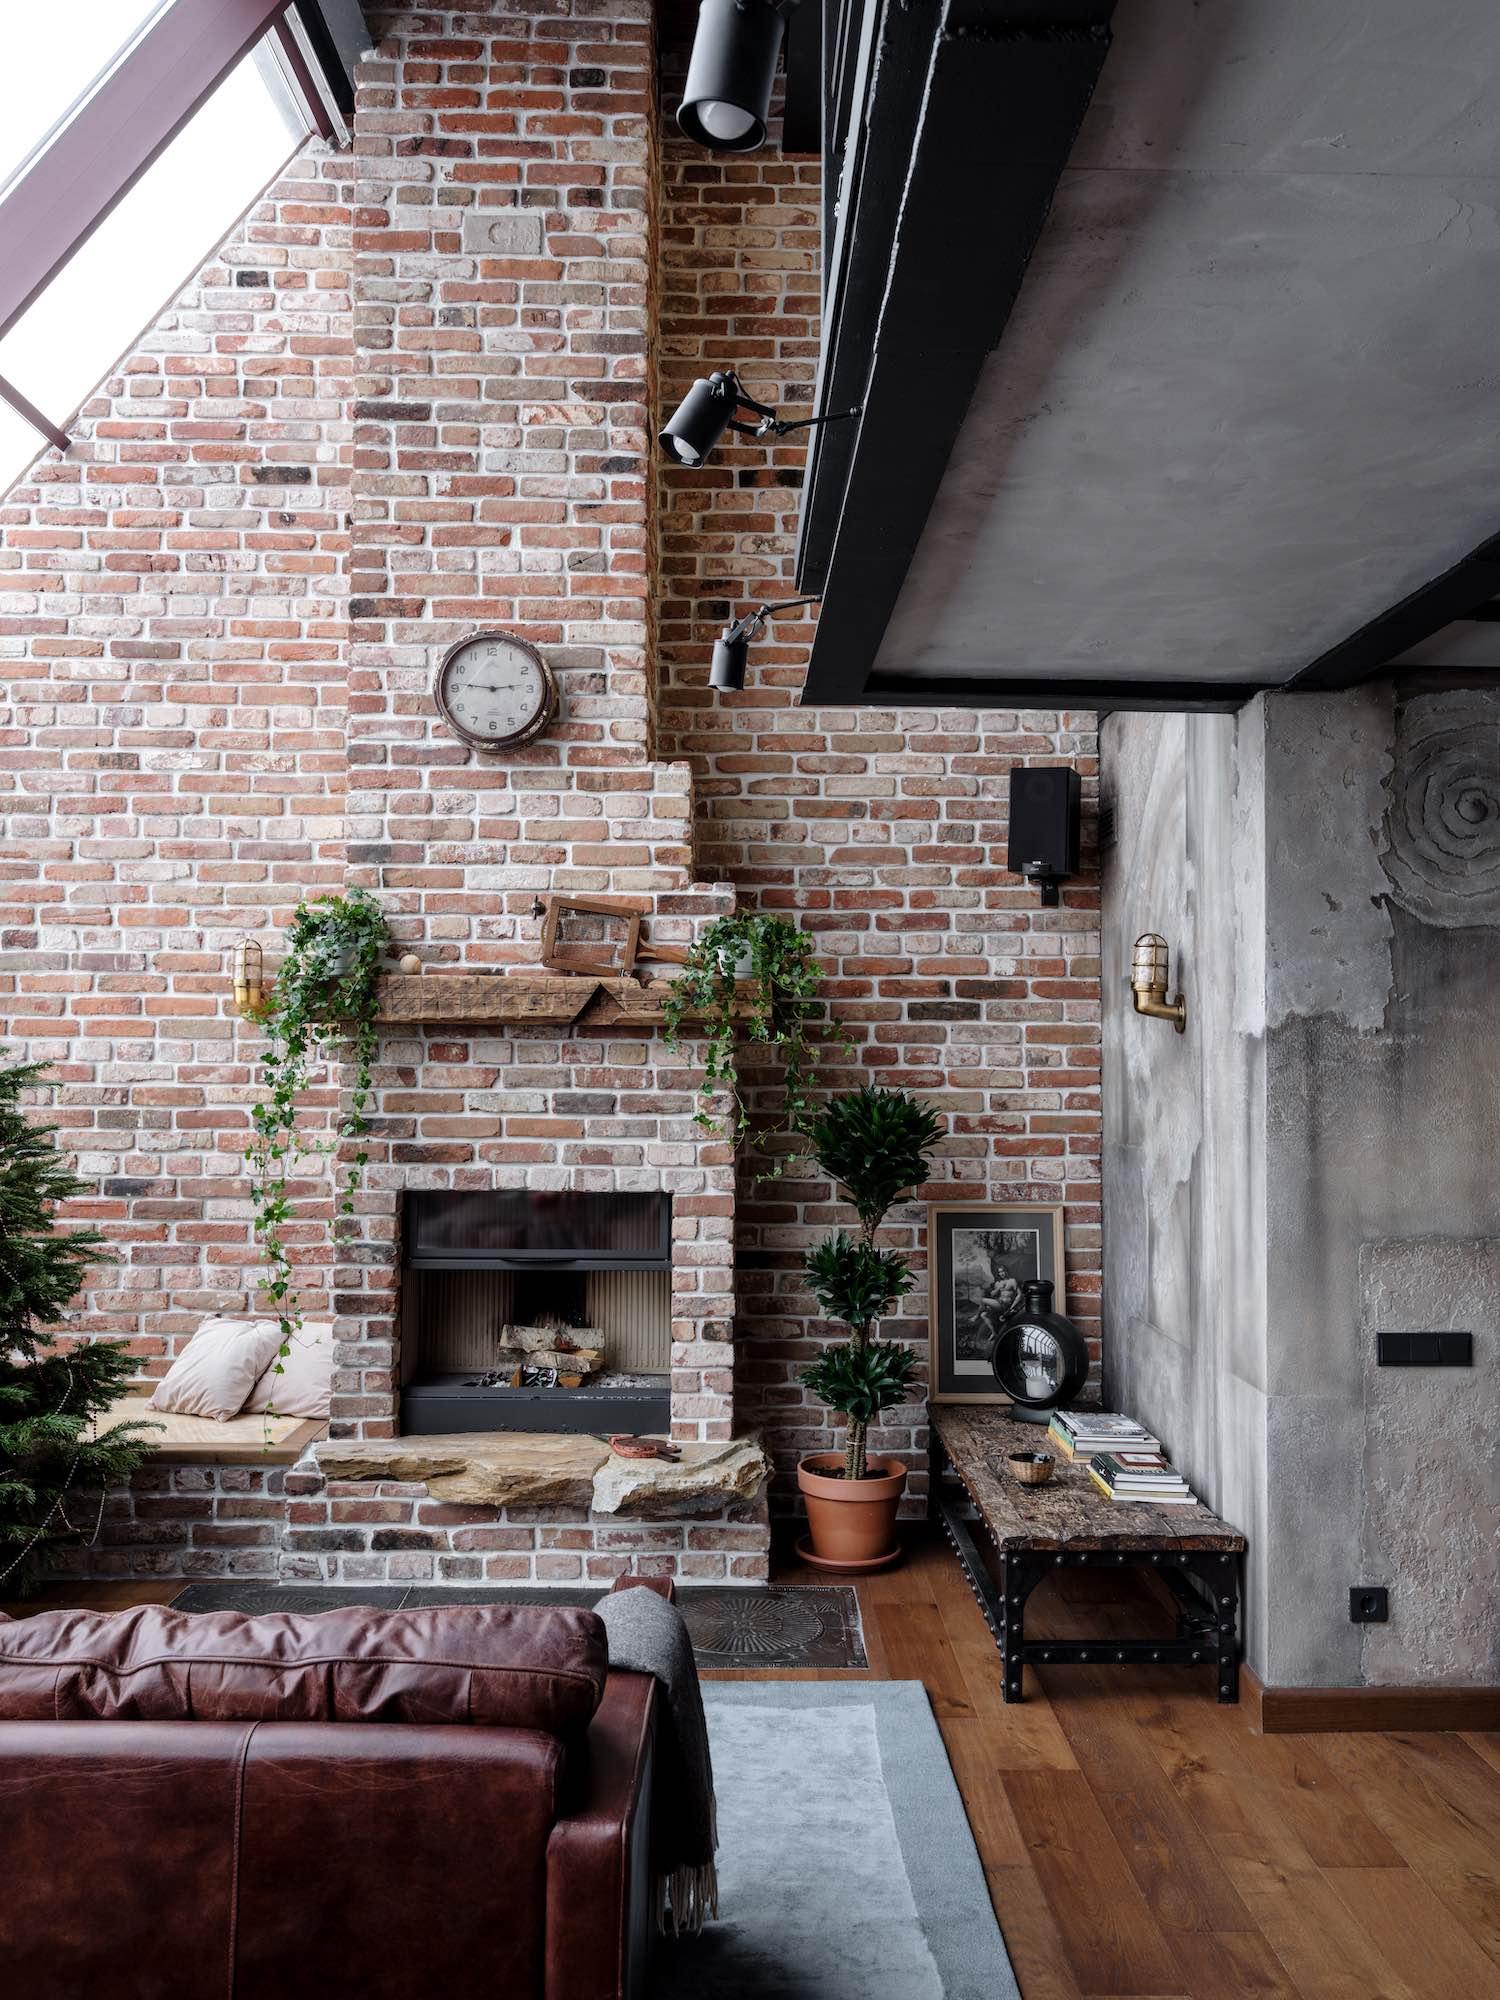 fireplace made with bricks